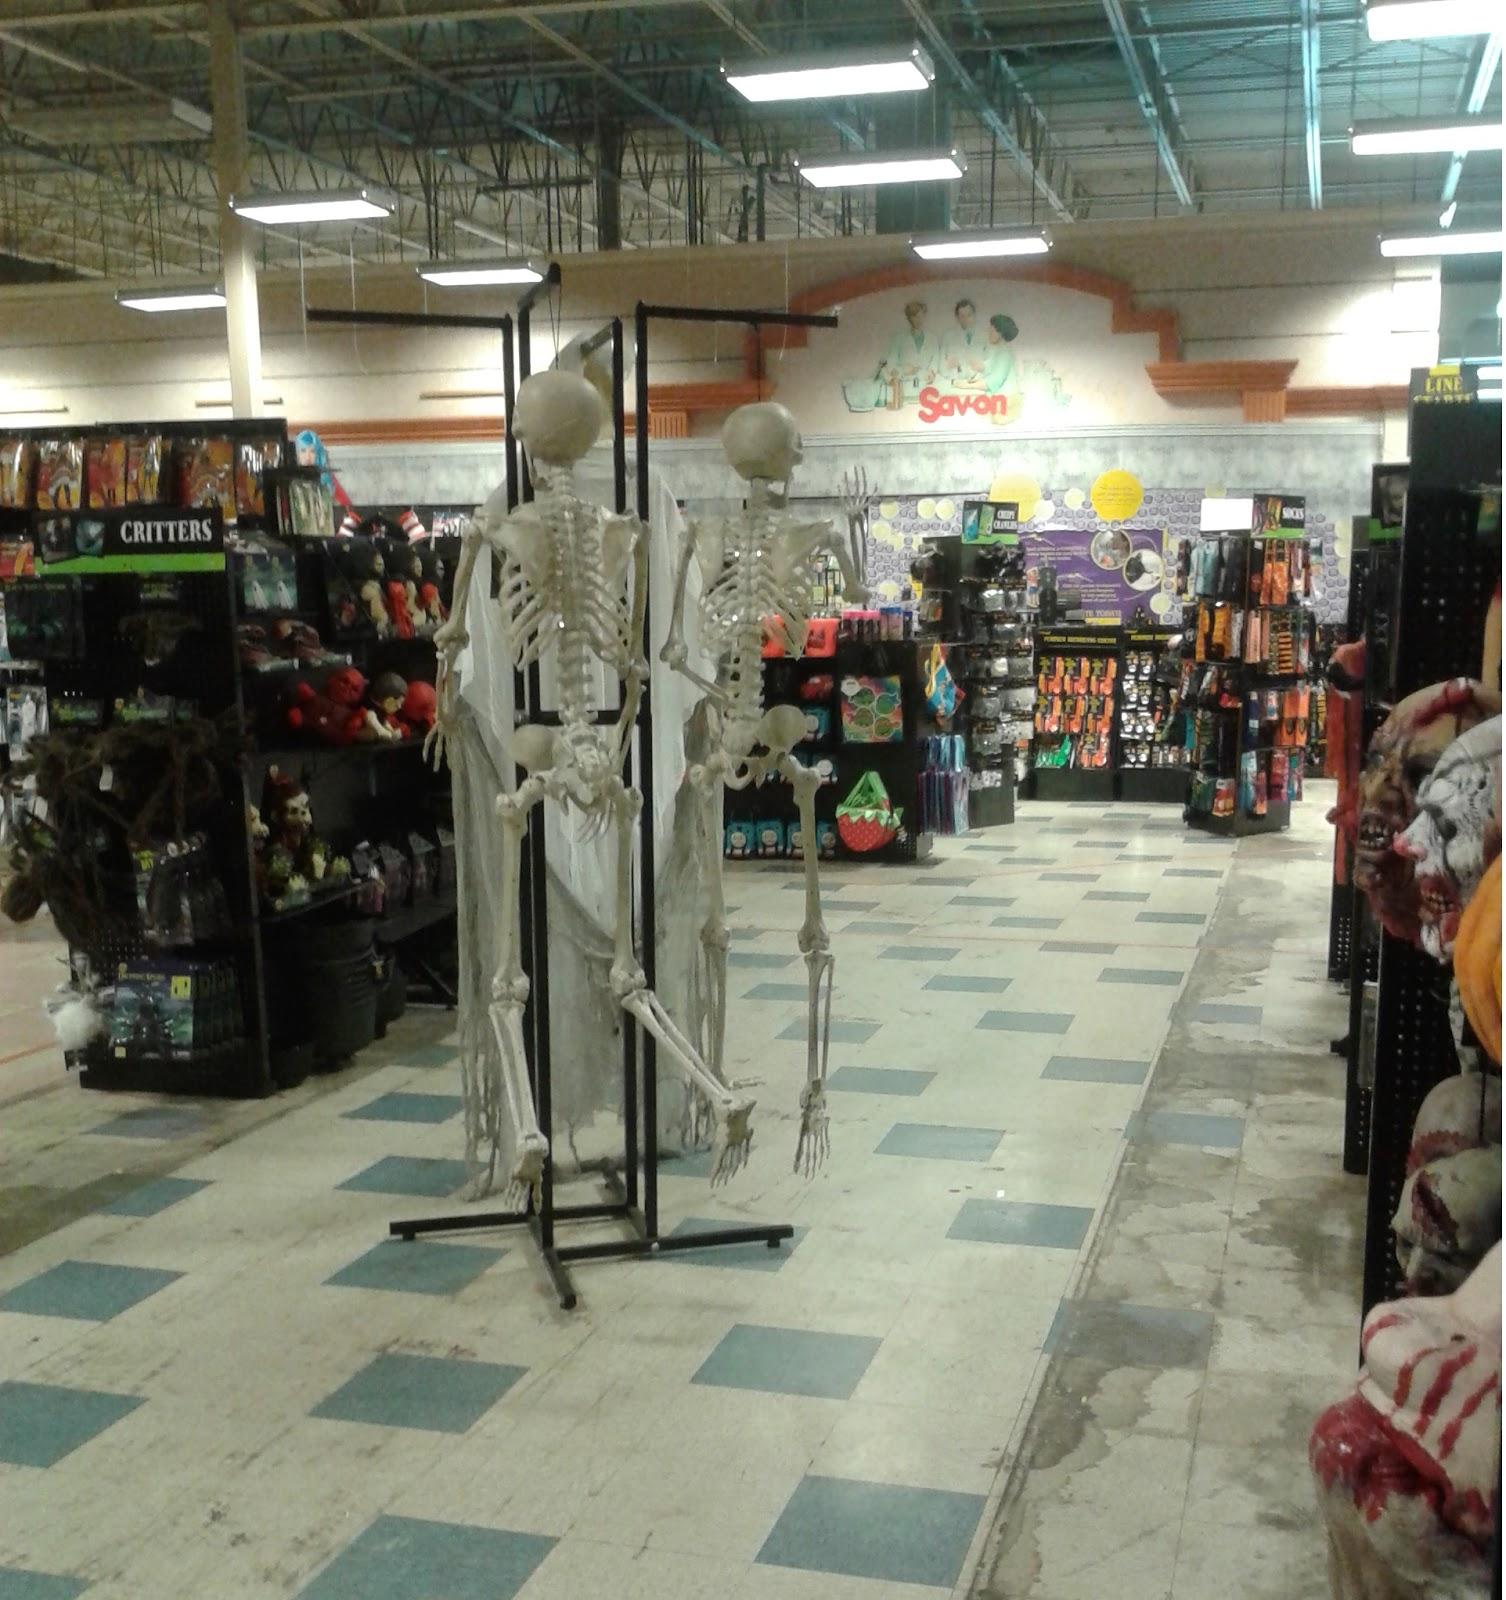 Albertsons Florida Blog: Former Albertsons #4471 - Sanford, FL - Part 2